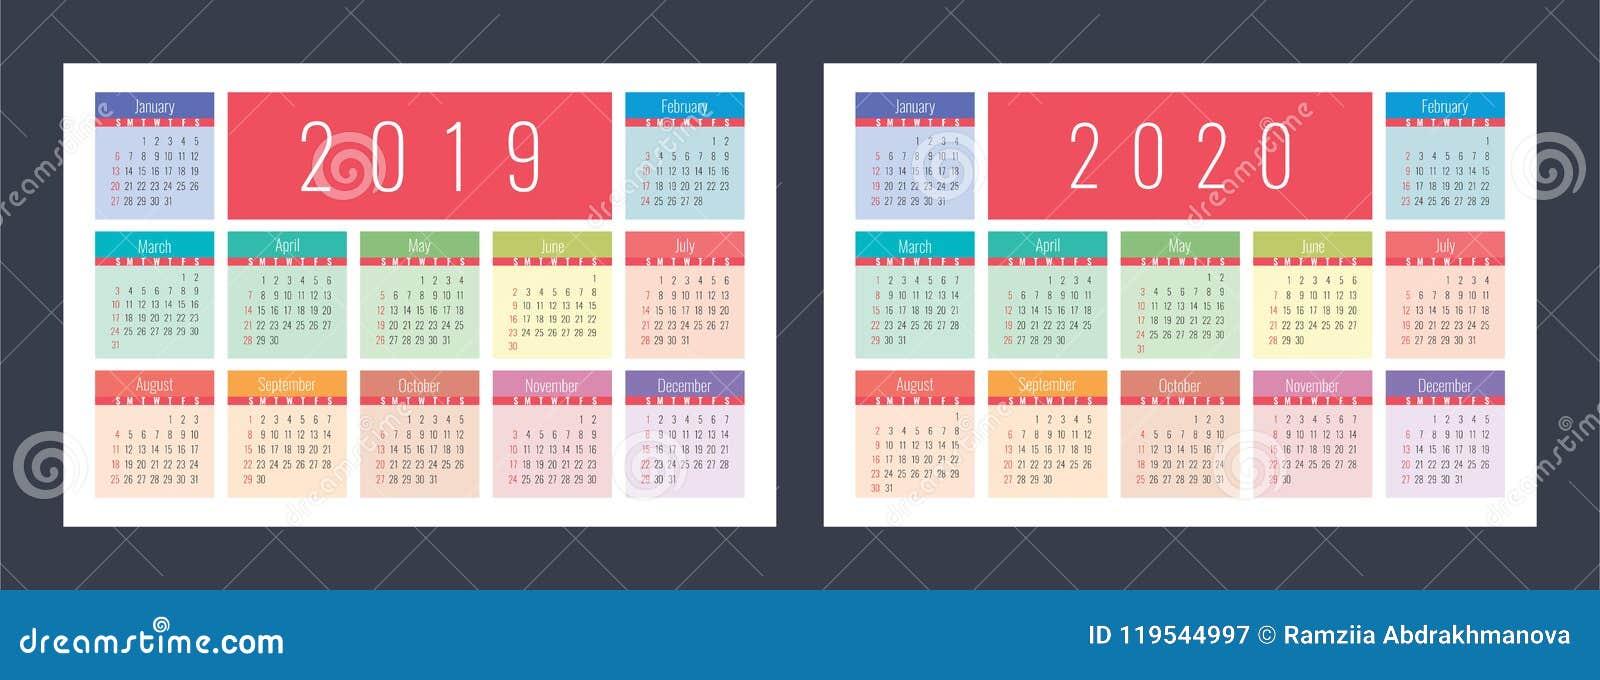 Cu Calendar 2020 Calendar 2019, 2020. Pocket Colorful Calender Set. Bright And Cu